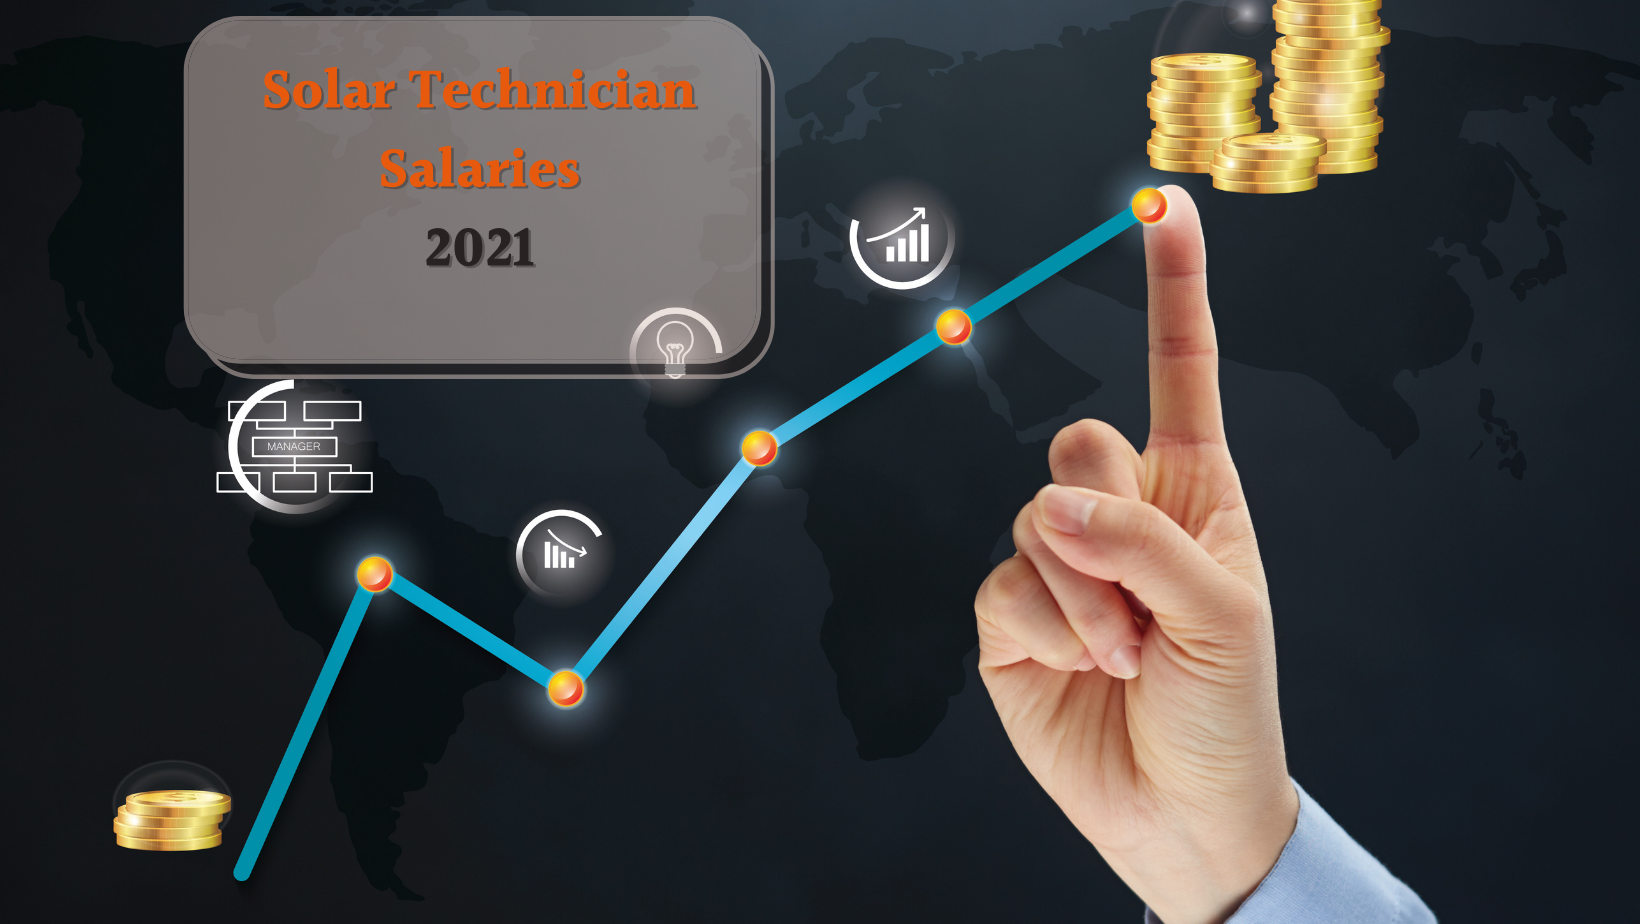 Solar Technician Salary 2021